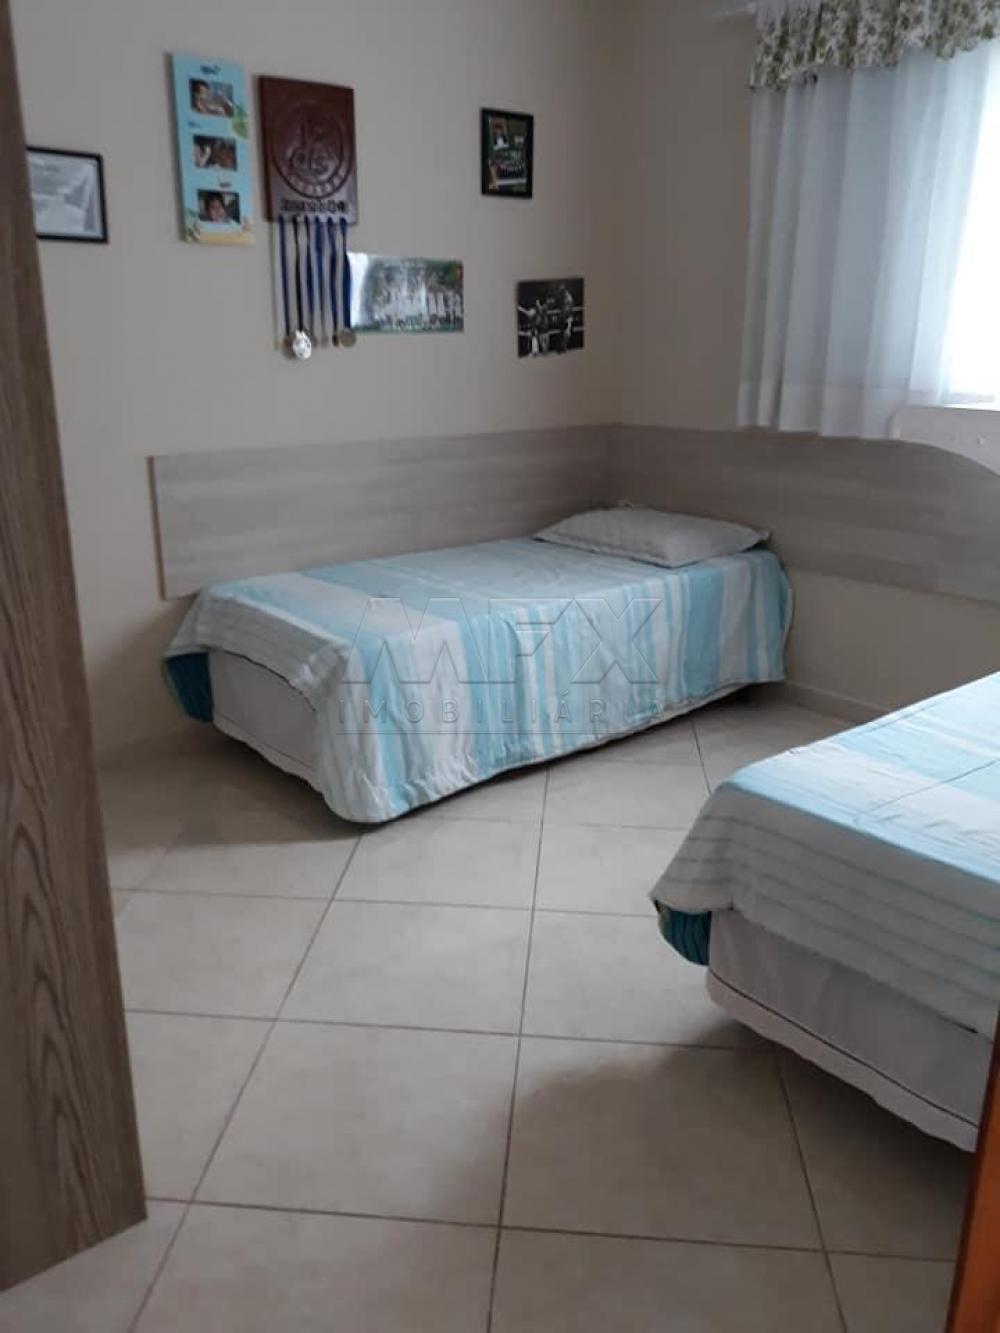 Comprar Casa / Condomínio em Bauru apenas R$ 750.000,00 - Foto 6